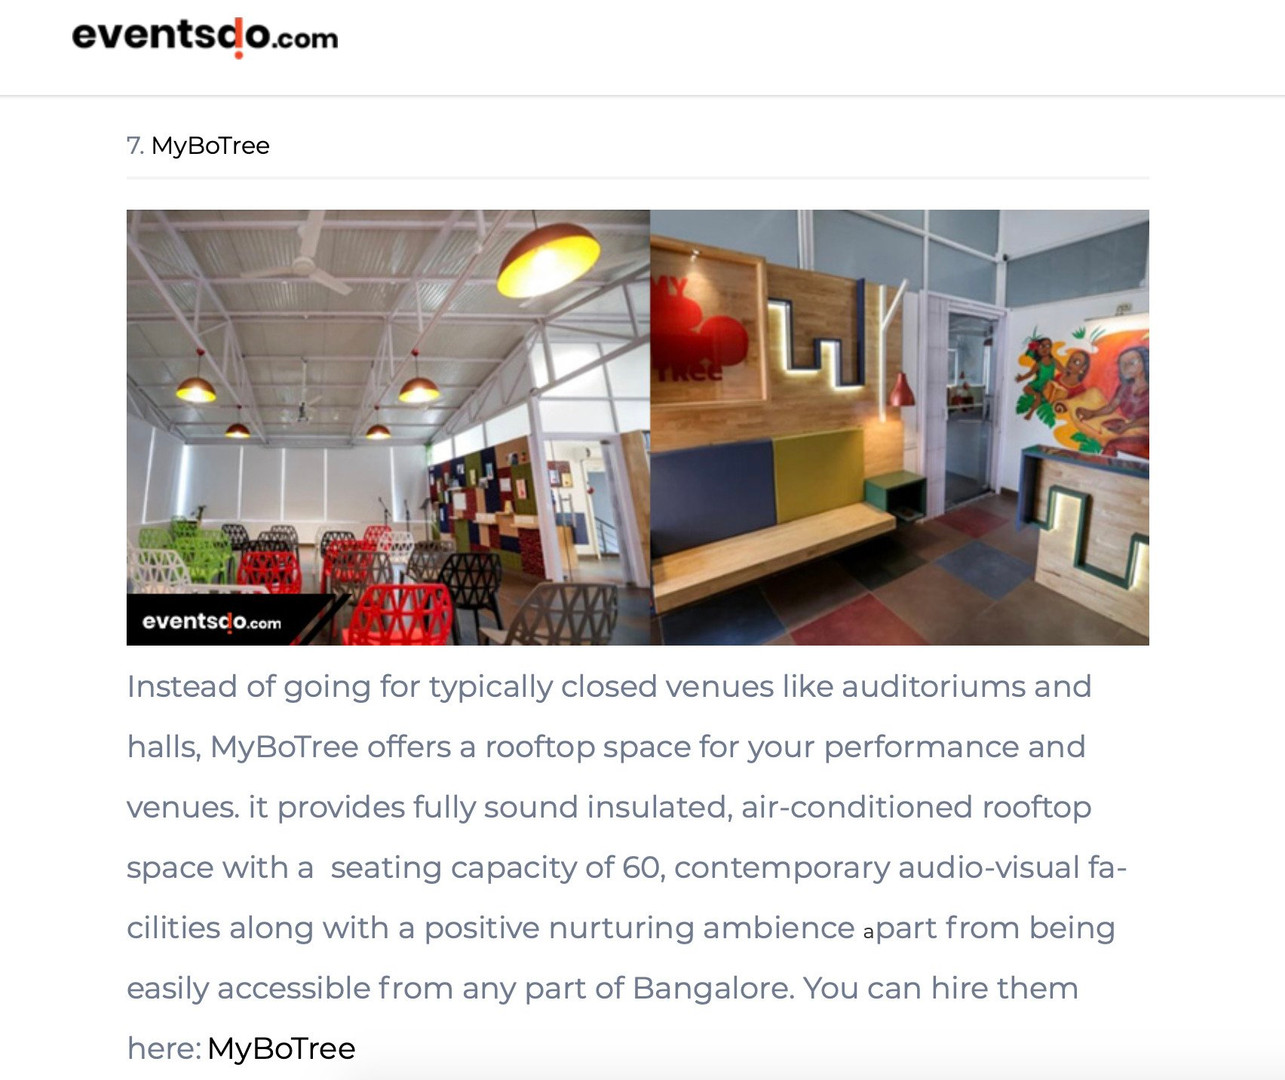 EventsDo Feature